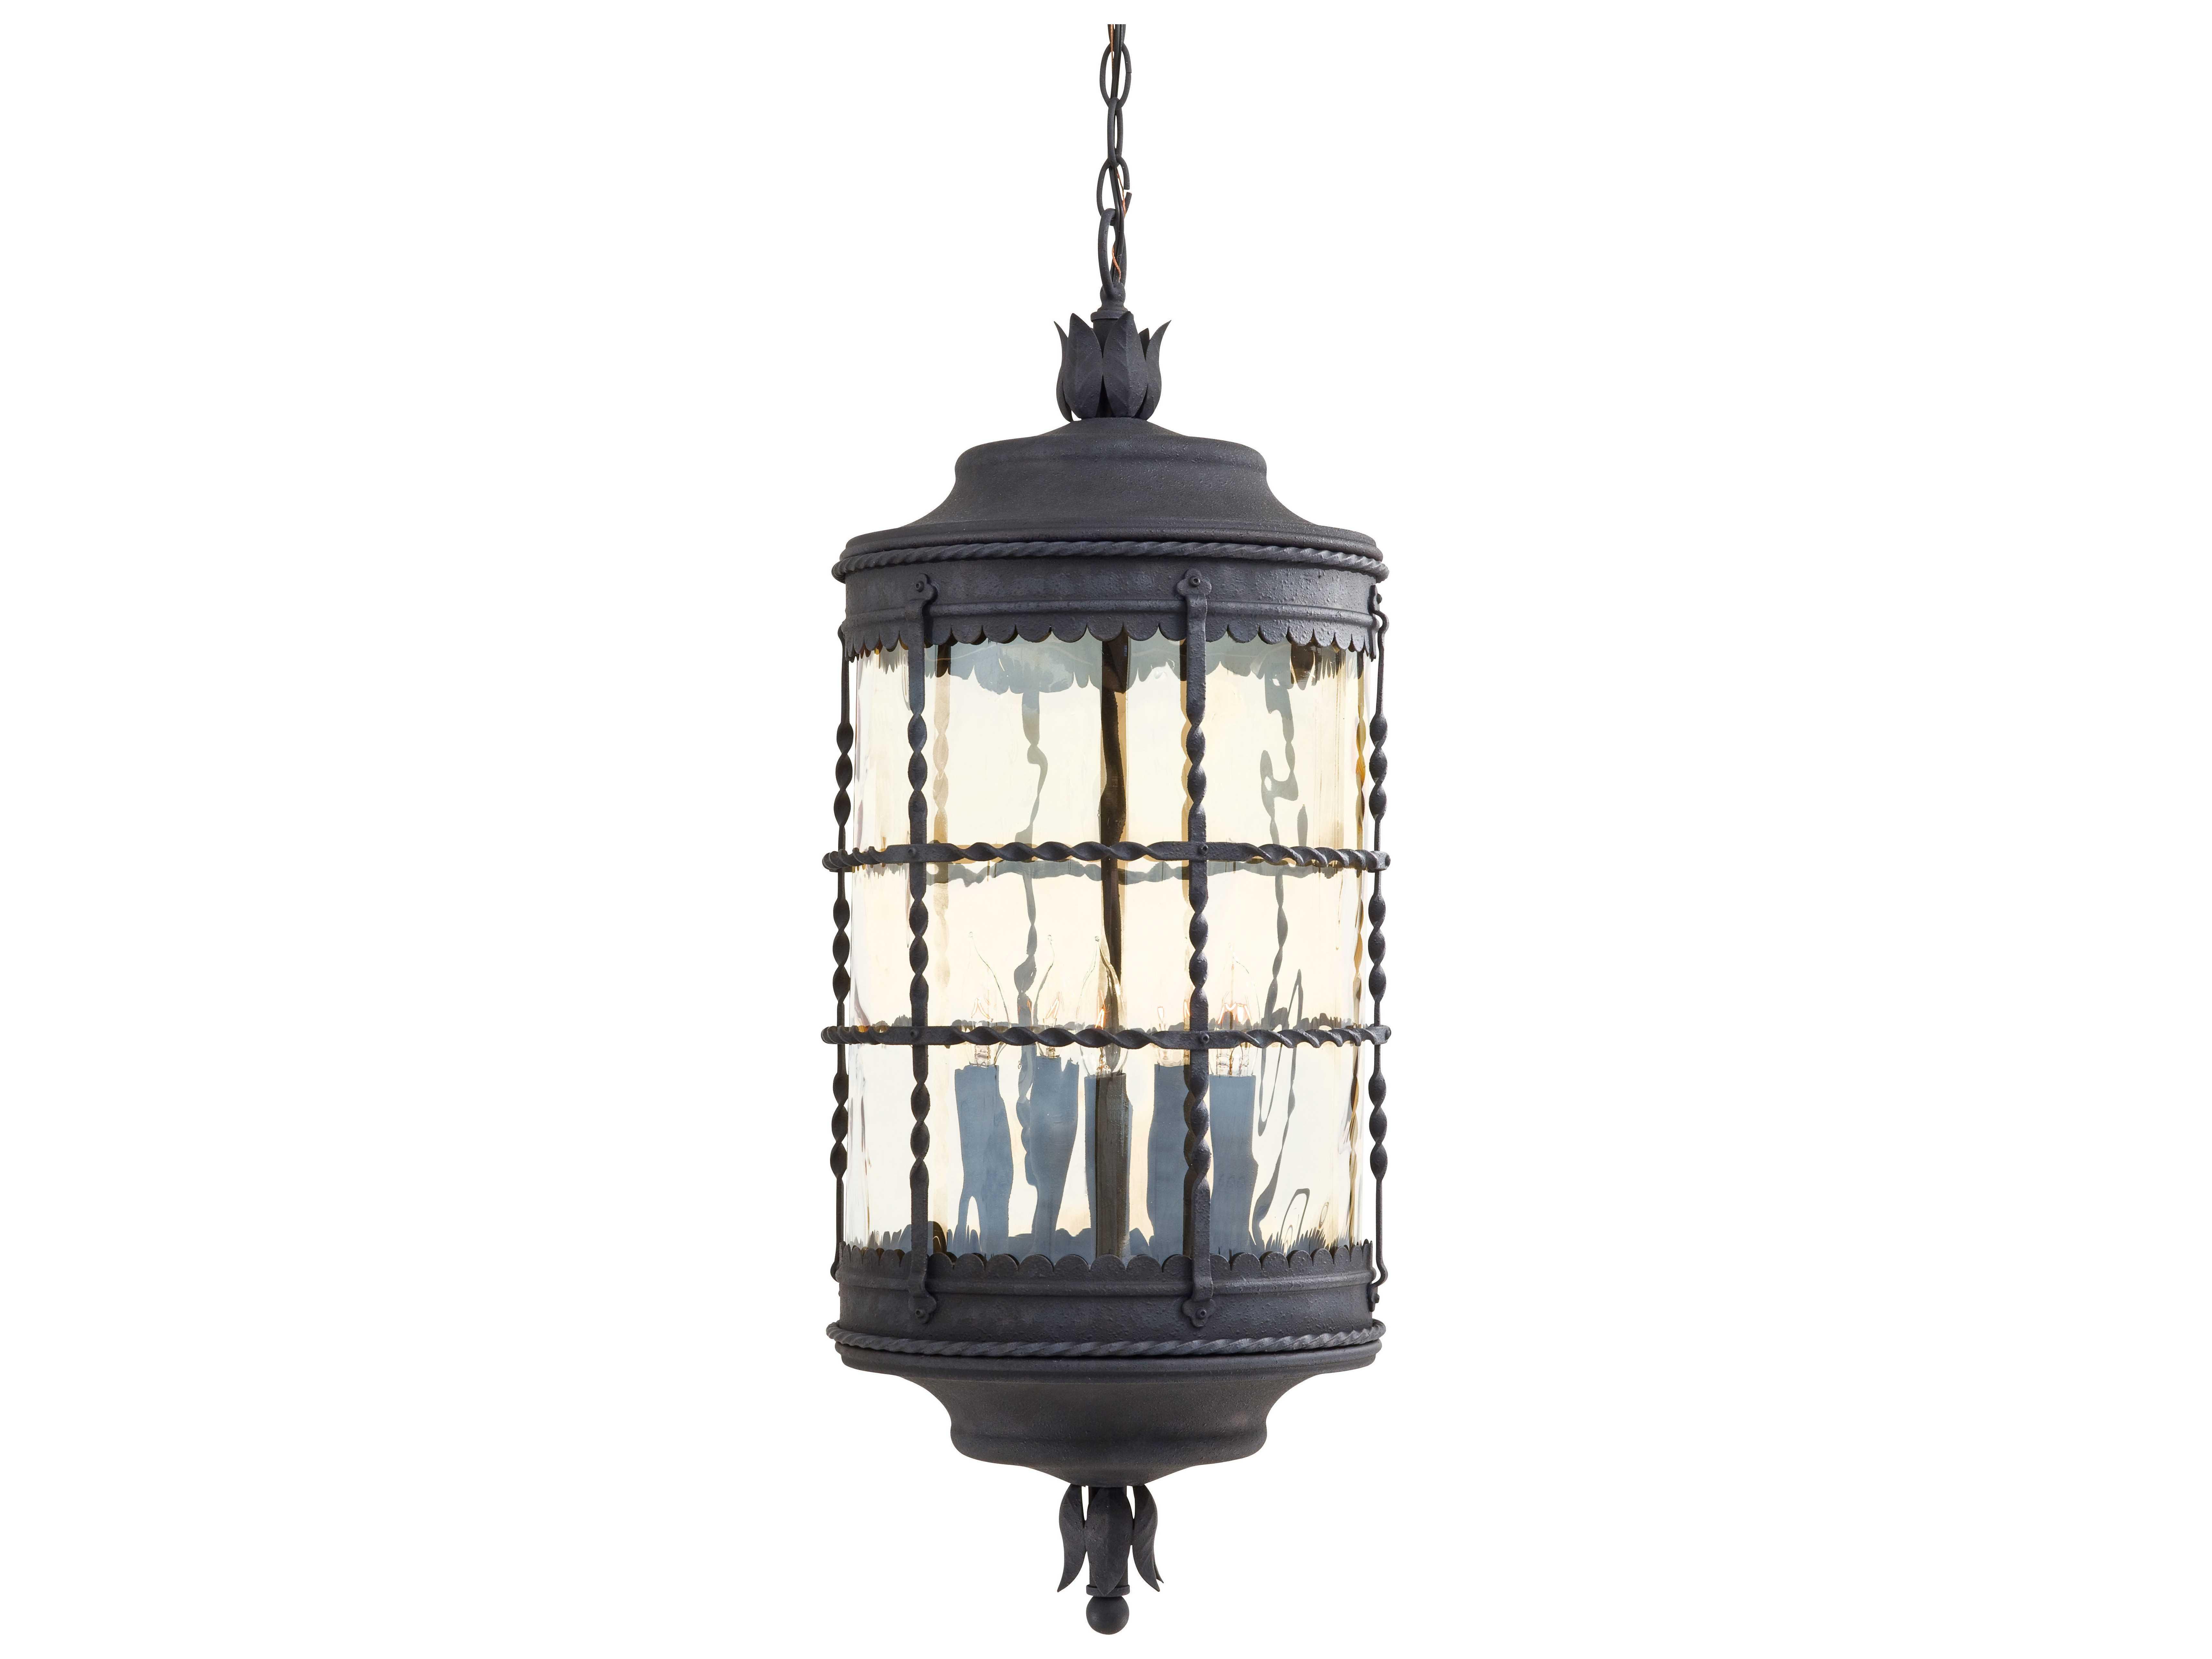 minka lavery mallorca spanish iron glass outdoor hanging light mgo8884a39